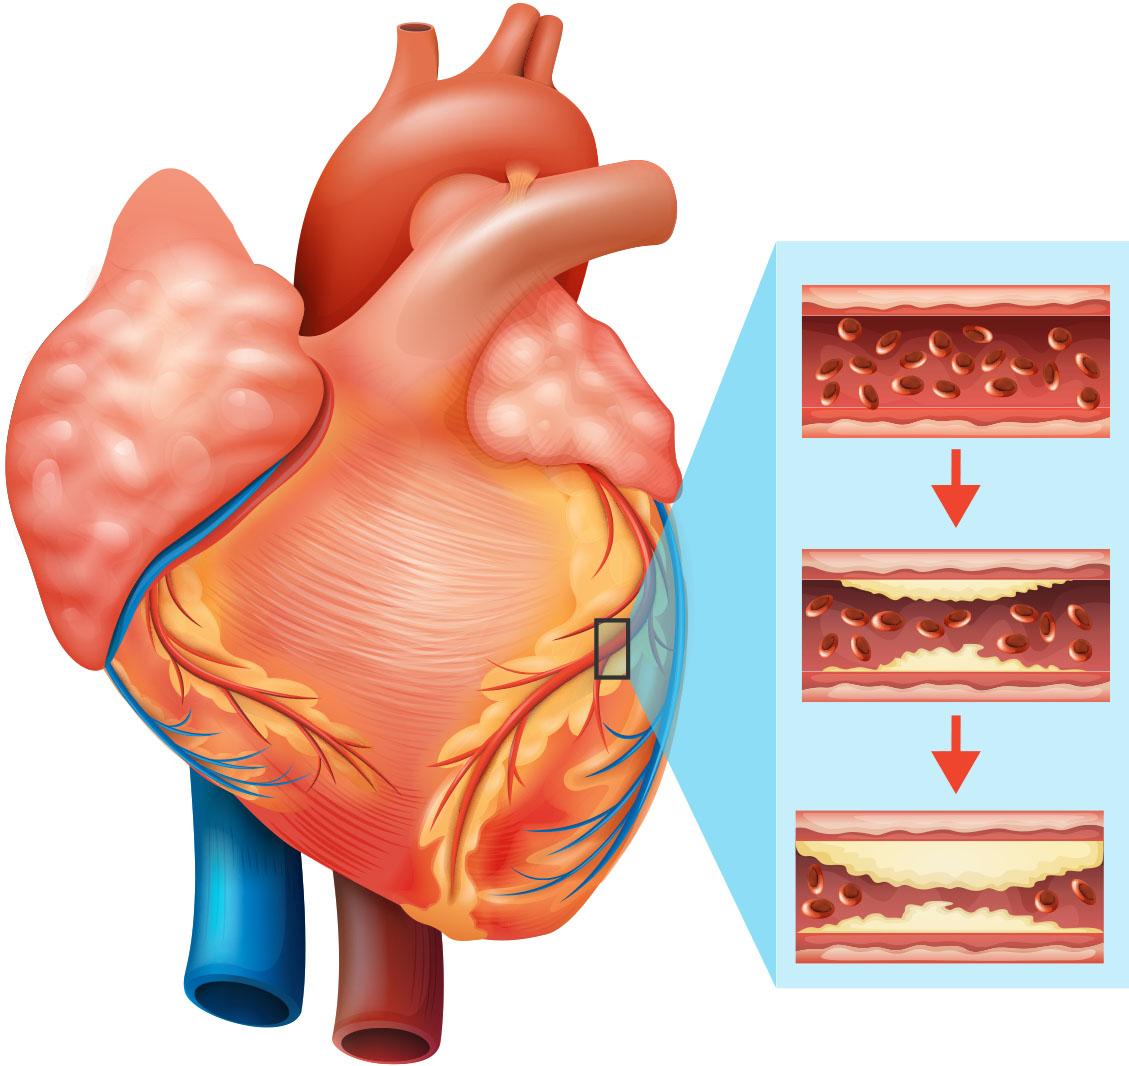 A Closer Look At Heart Disease Risk